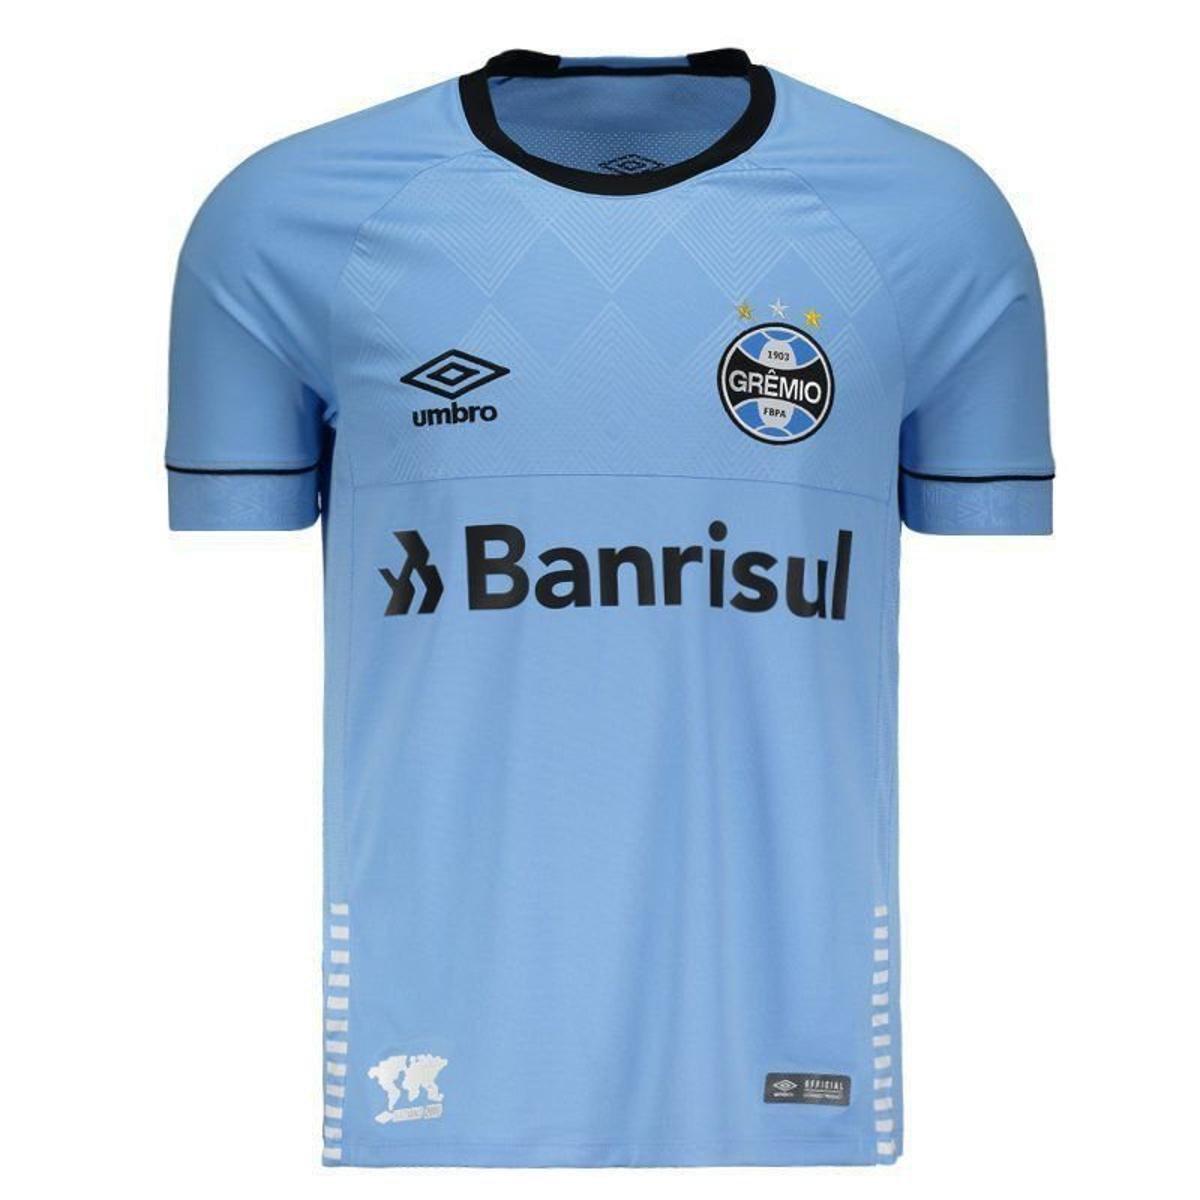 8ab397770f509 Camisa Umbro Grêmio II 2018 Charrua N°3 Geromel Masculina - Azul - Compre  Agora